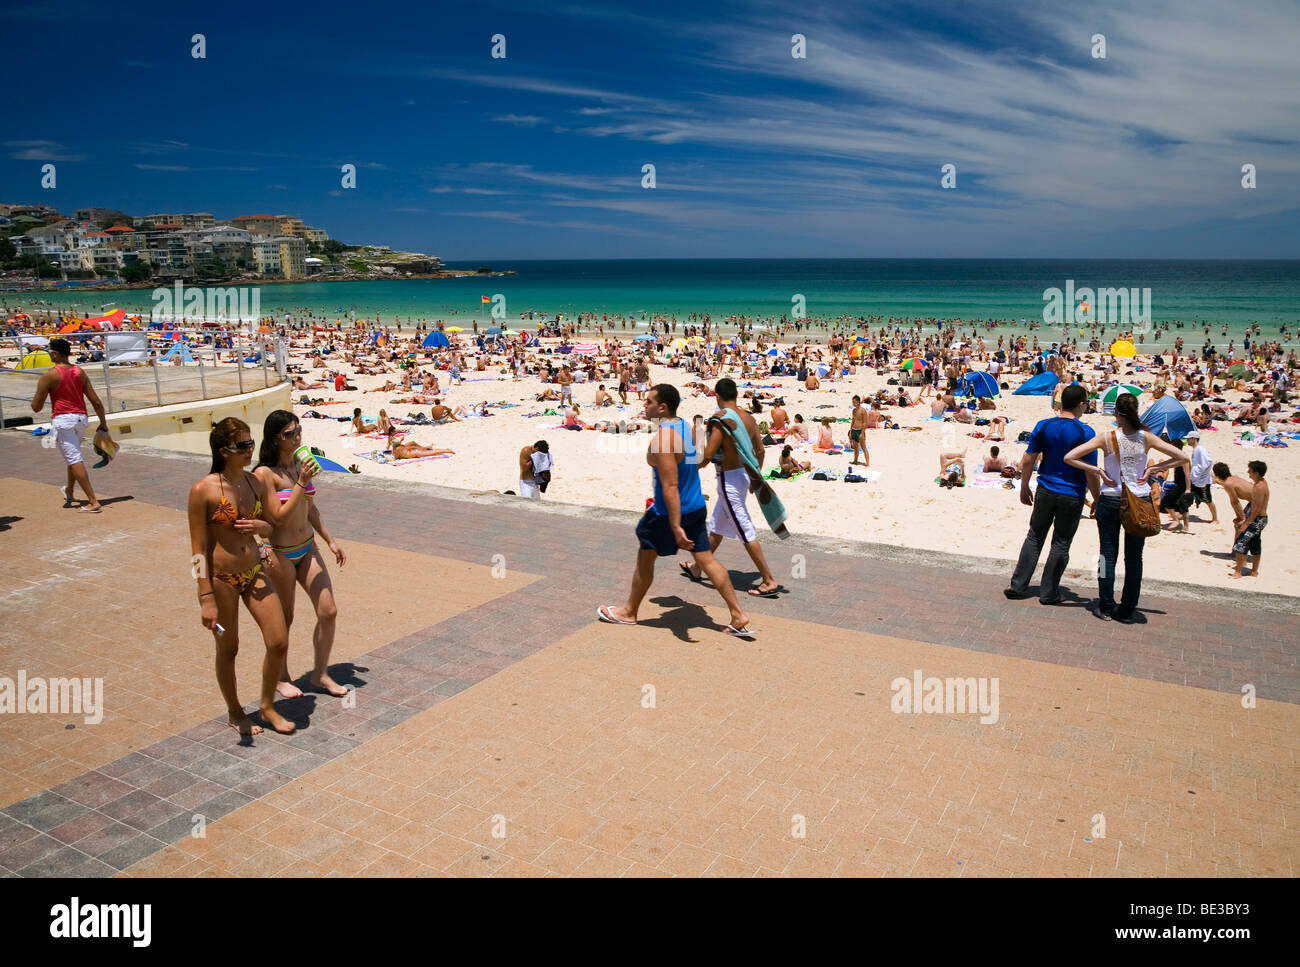 Summer crowds at Bondi Beach. Sydney, New South Wales, AUSTRALIA - Stock Image